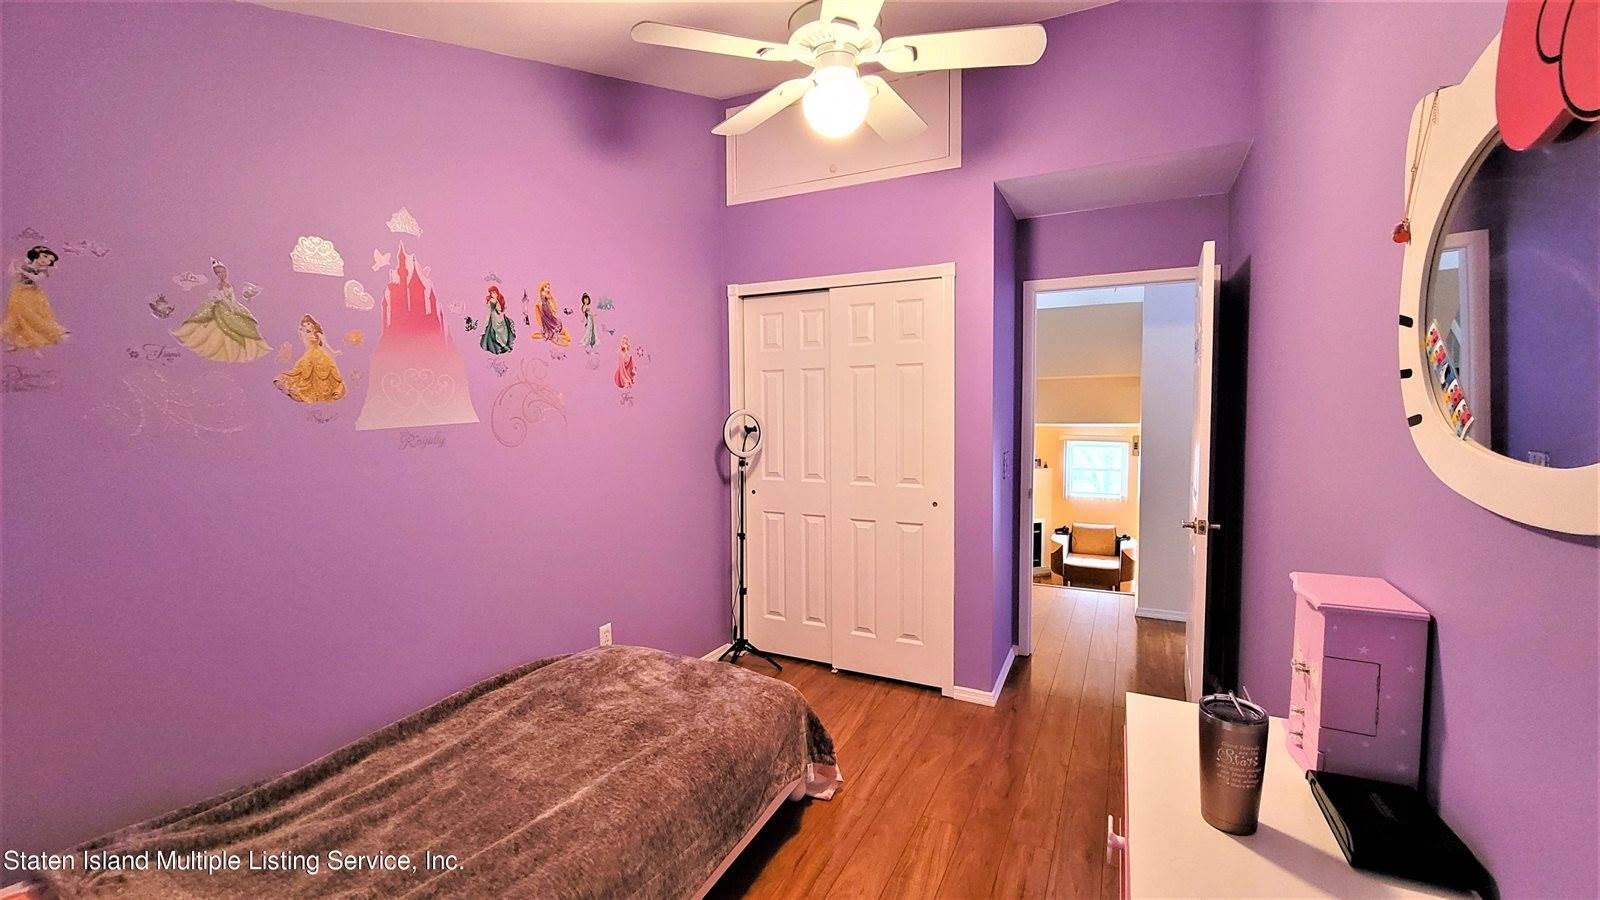 19 Jessica Court, Staten Island, NY 10312